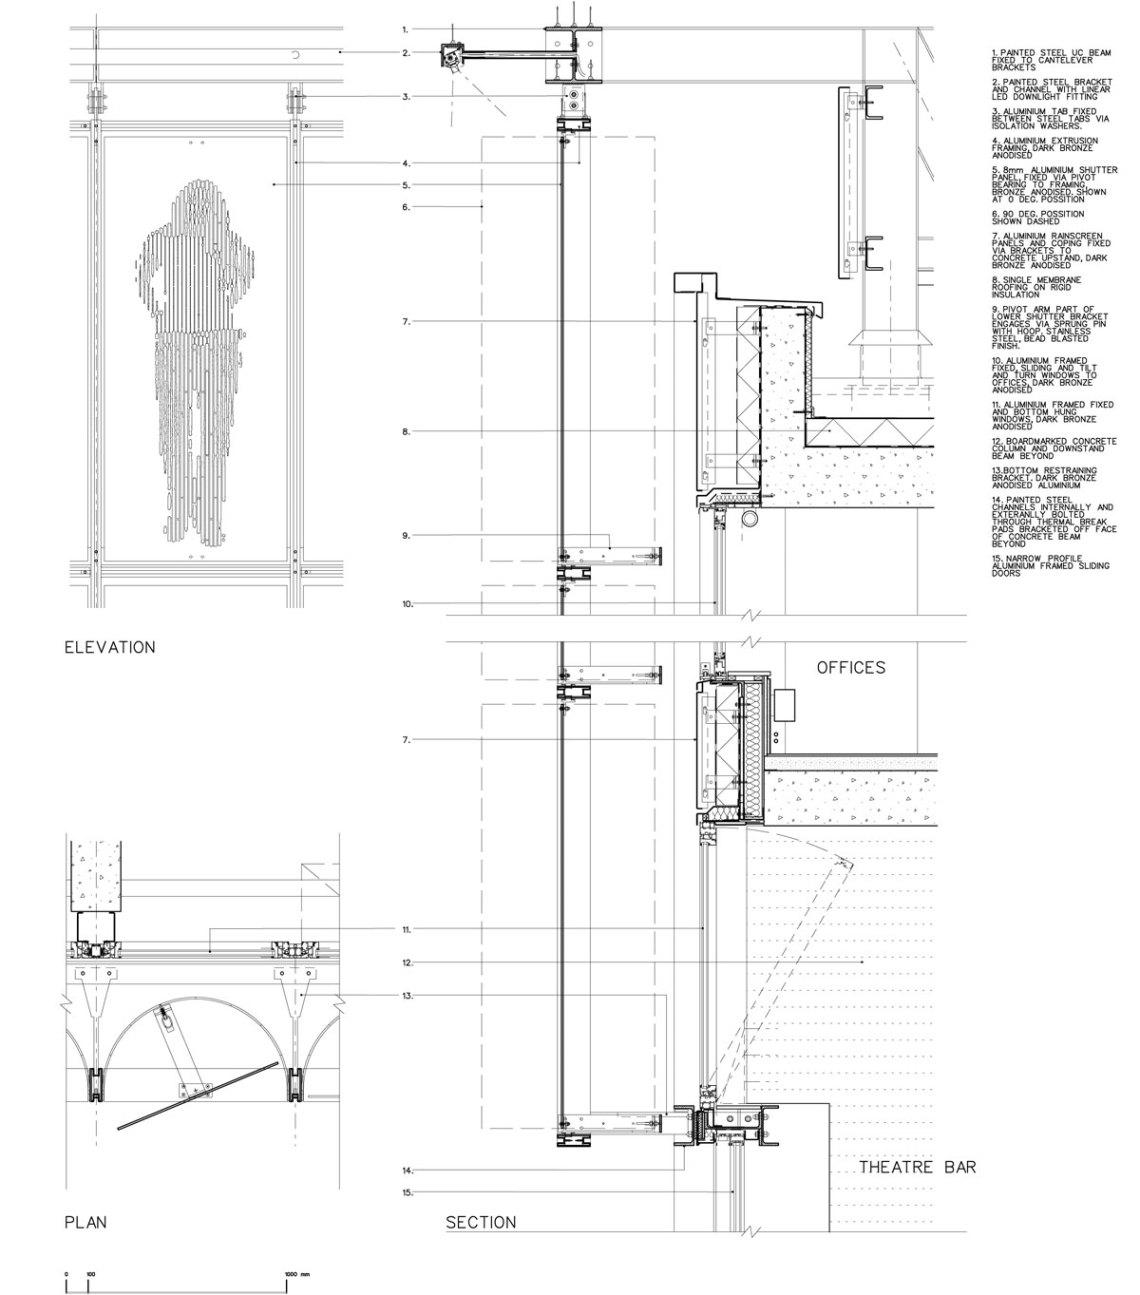 Liverpool Everyman Theatre / Haworth Tompkins Architects Construction Detail